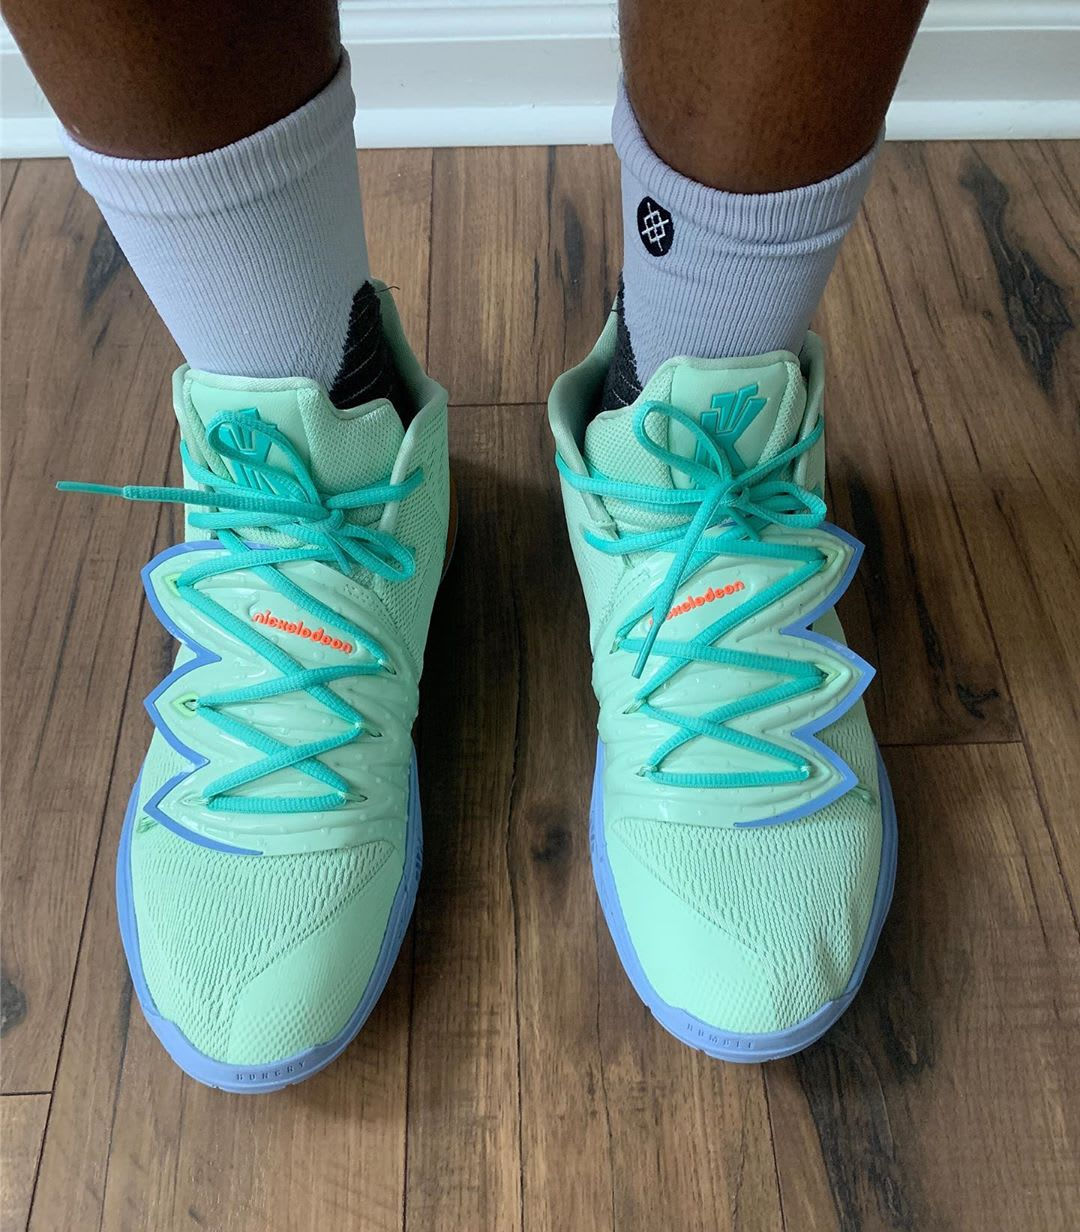 Nike Kyrie 5 Squidward Top